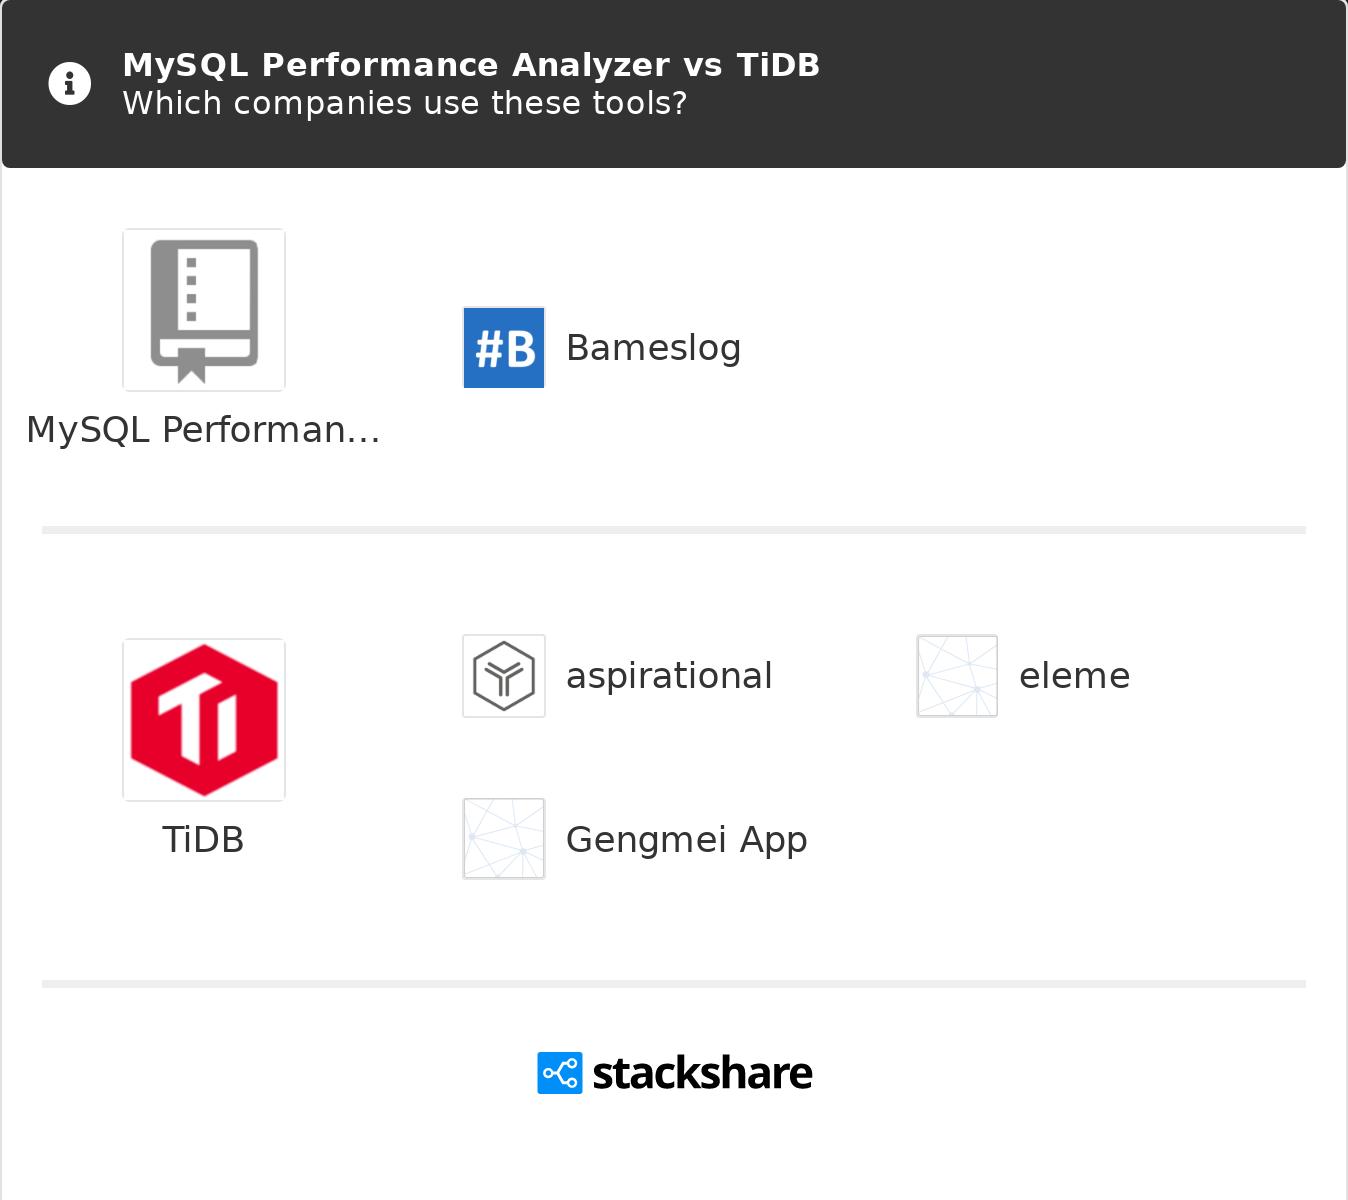 MySQL Performance Analyzer vs TiDB | What are the differences?